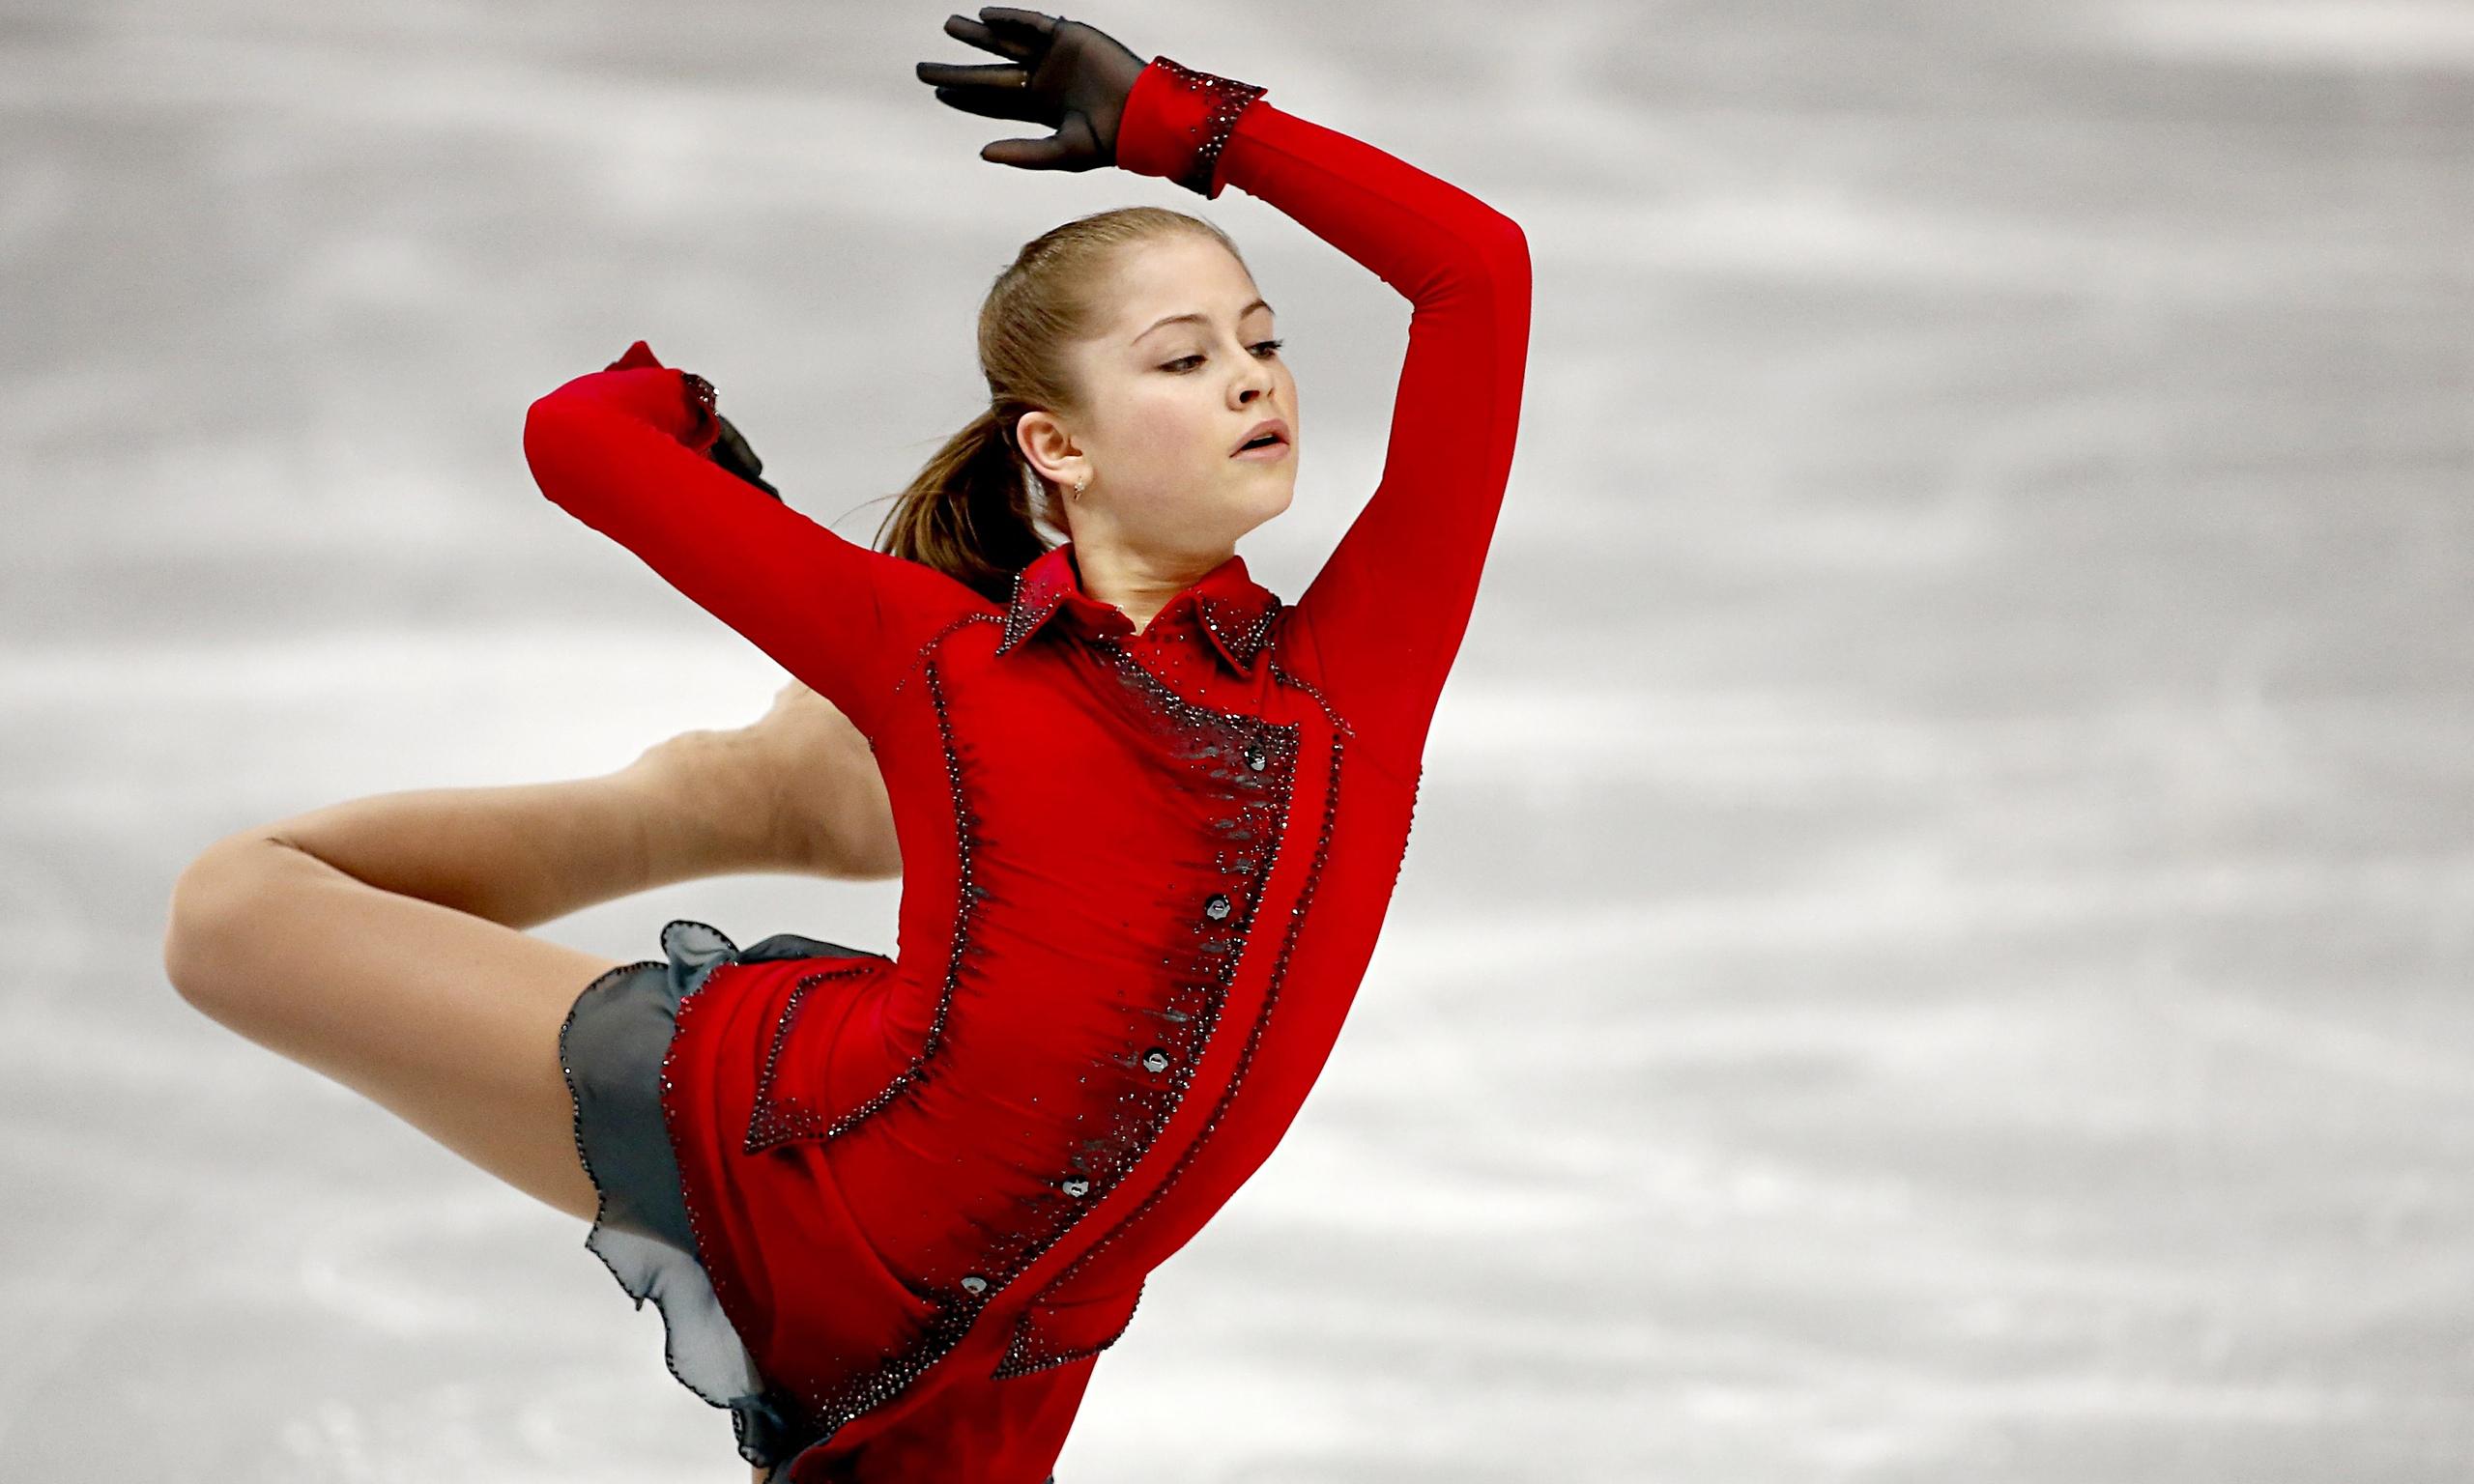 Yulia Lipnitskaya Gold Medal 404 | Guardian News &a...